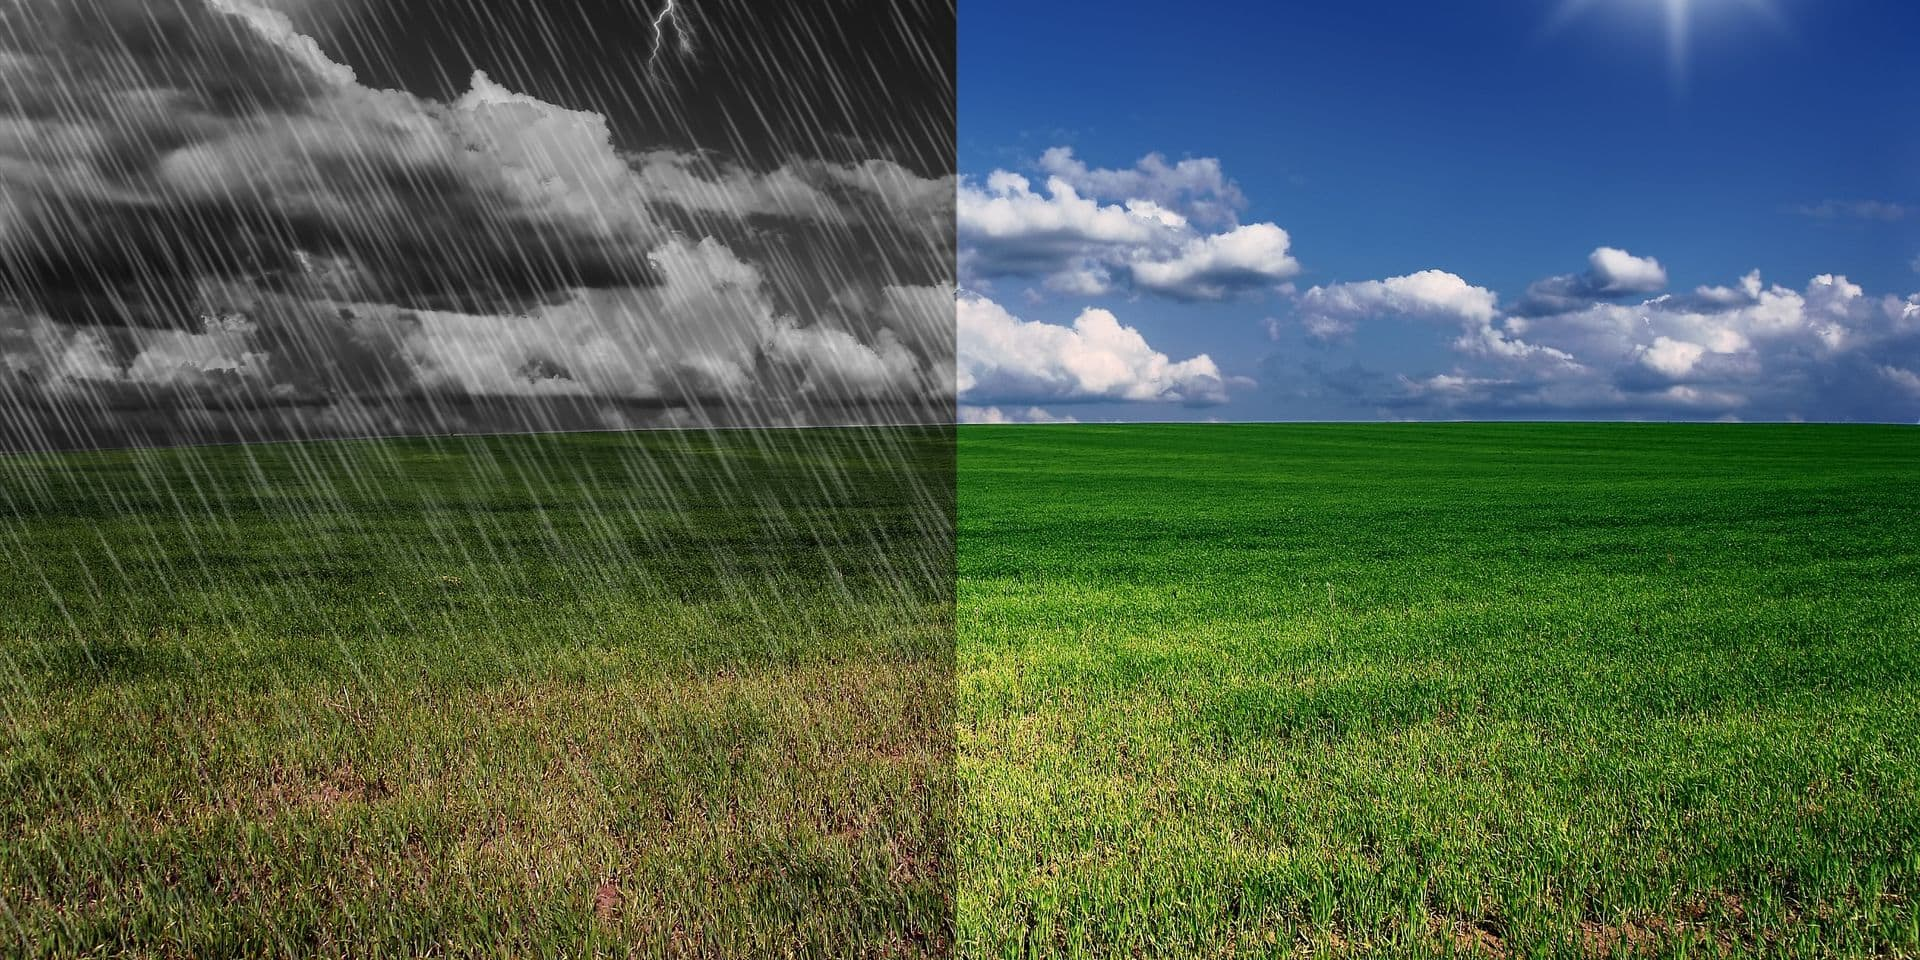 Météo : Dernières averses avant un week-end au sec